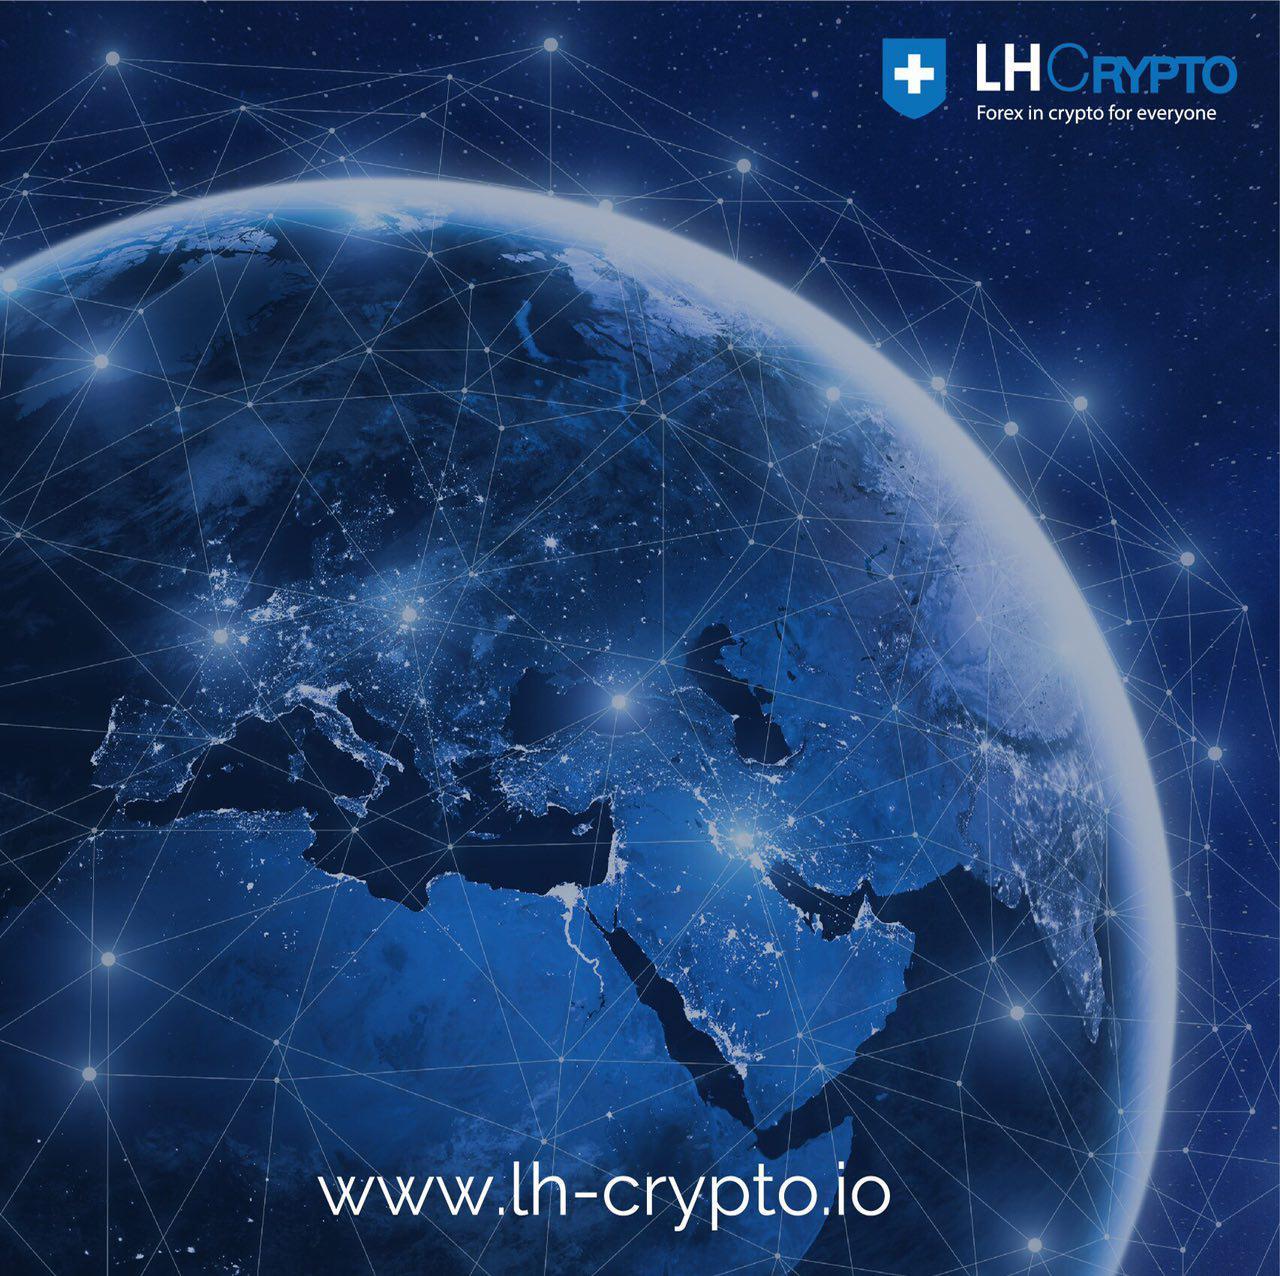 lhcrypto.jpg